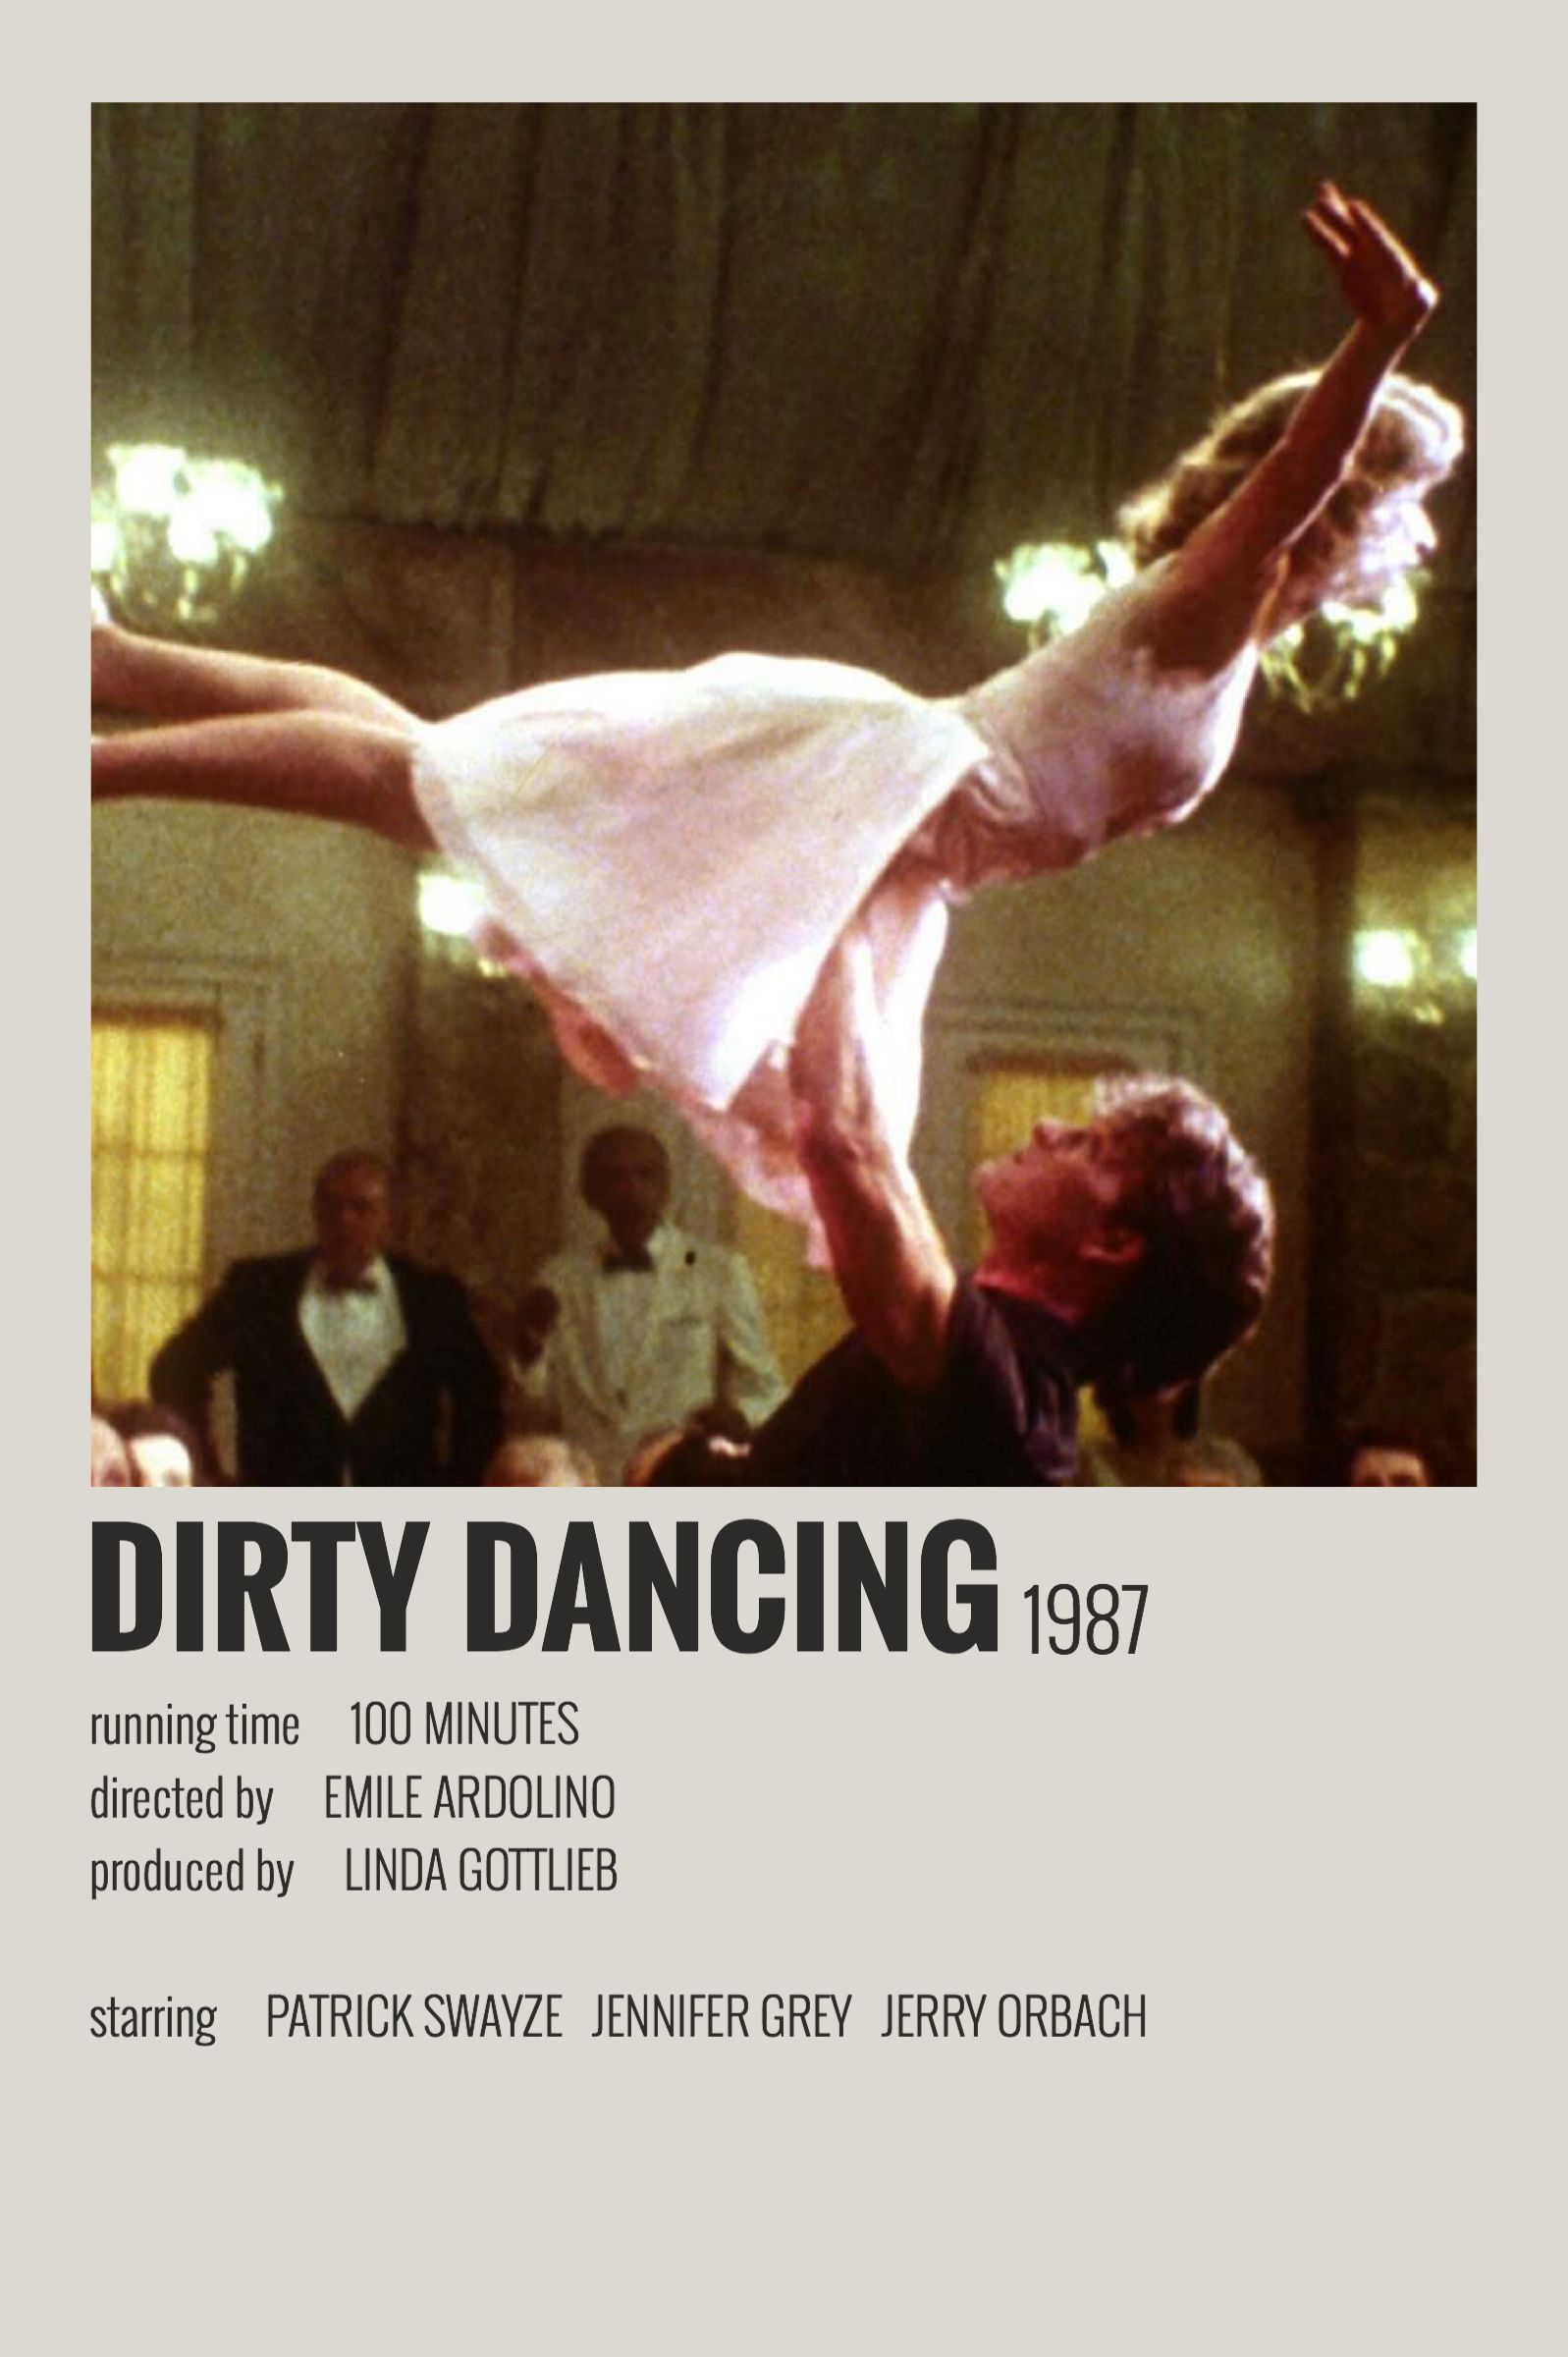 Alternative Minimalist Movie/Show Polaroid Poster - Dirty Dancing